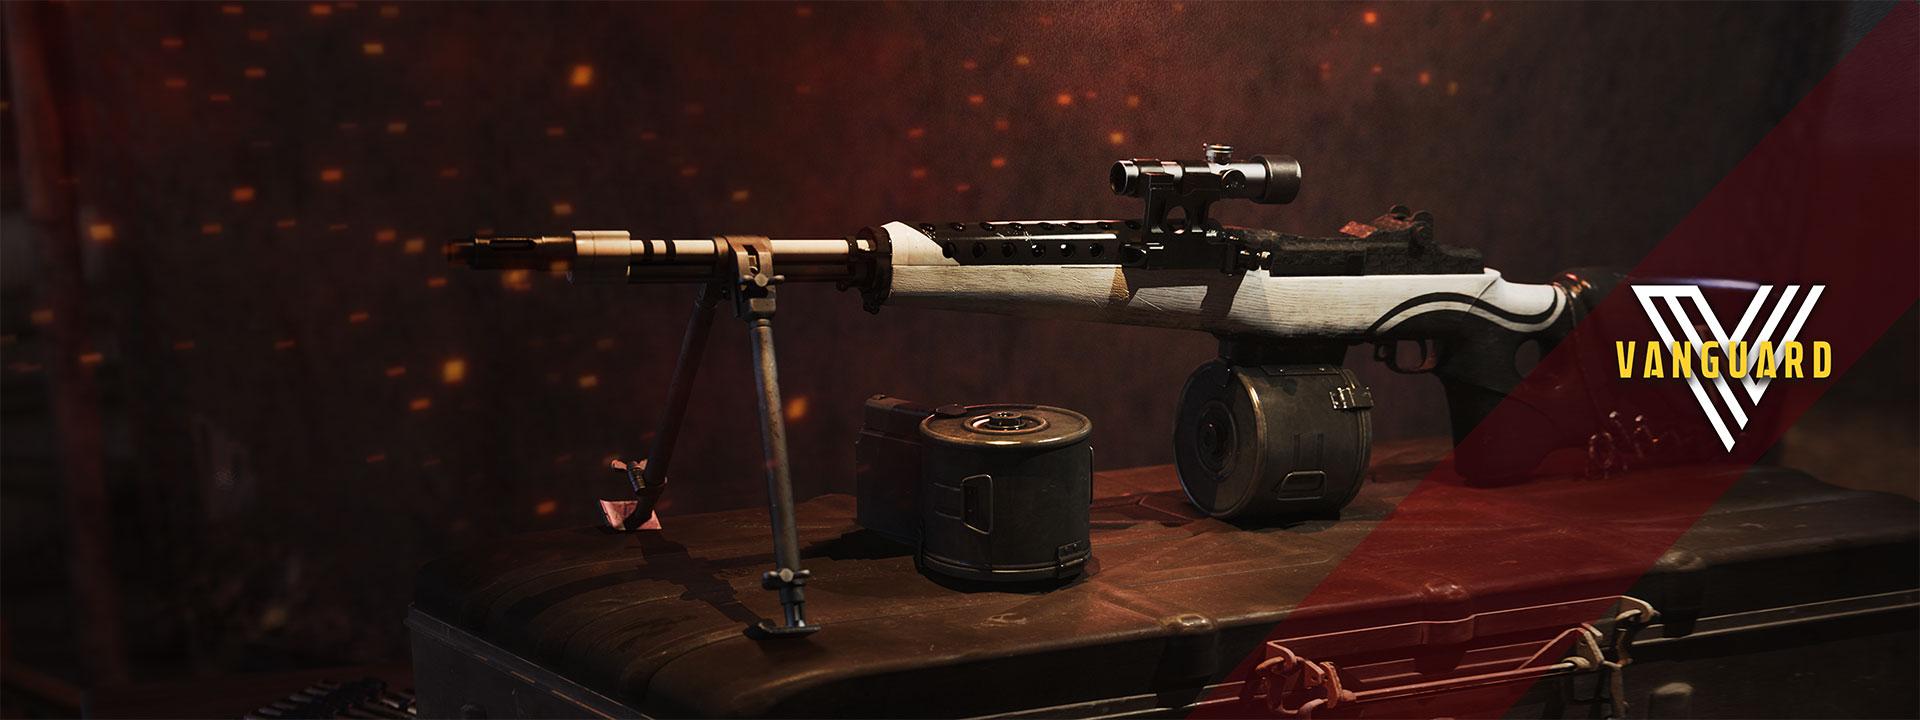 m1-garand-arme-warzone-vanguard-call-of-duty